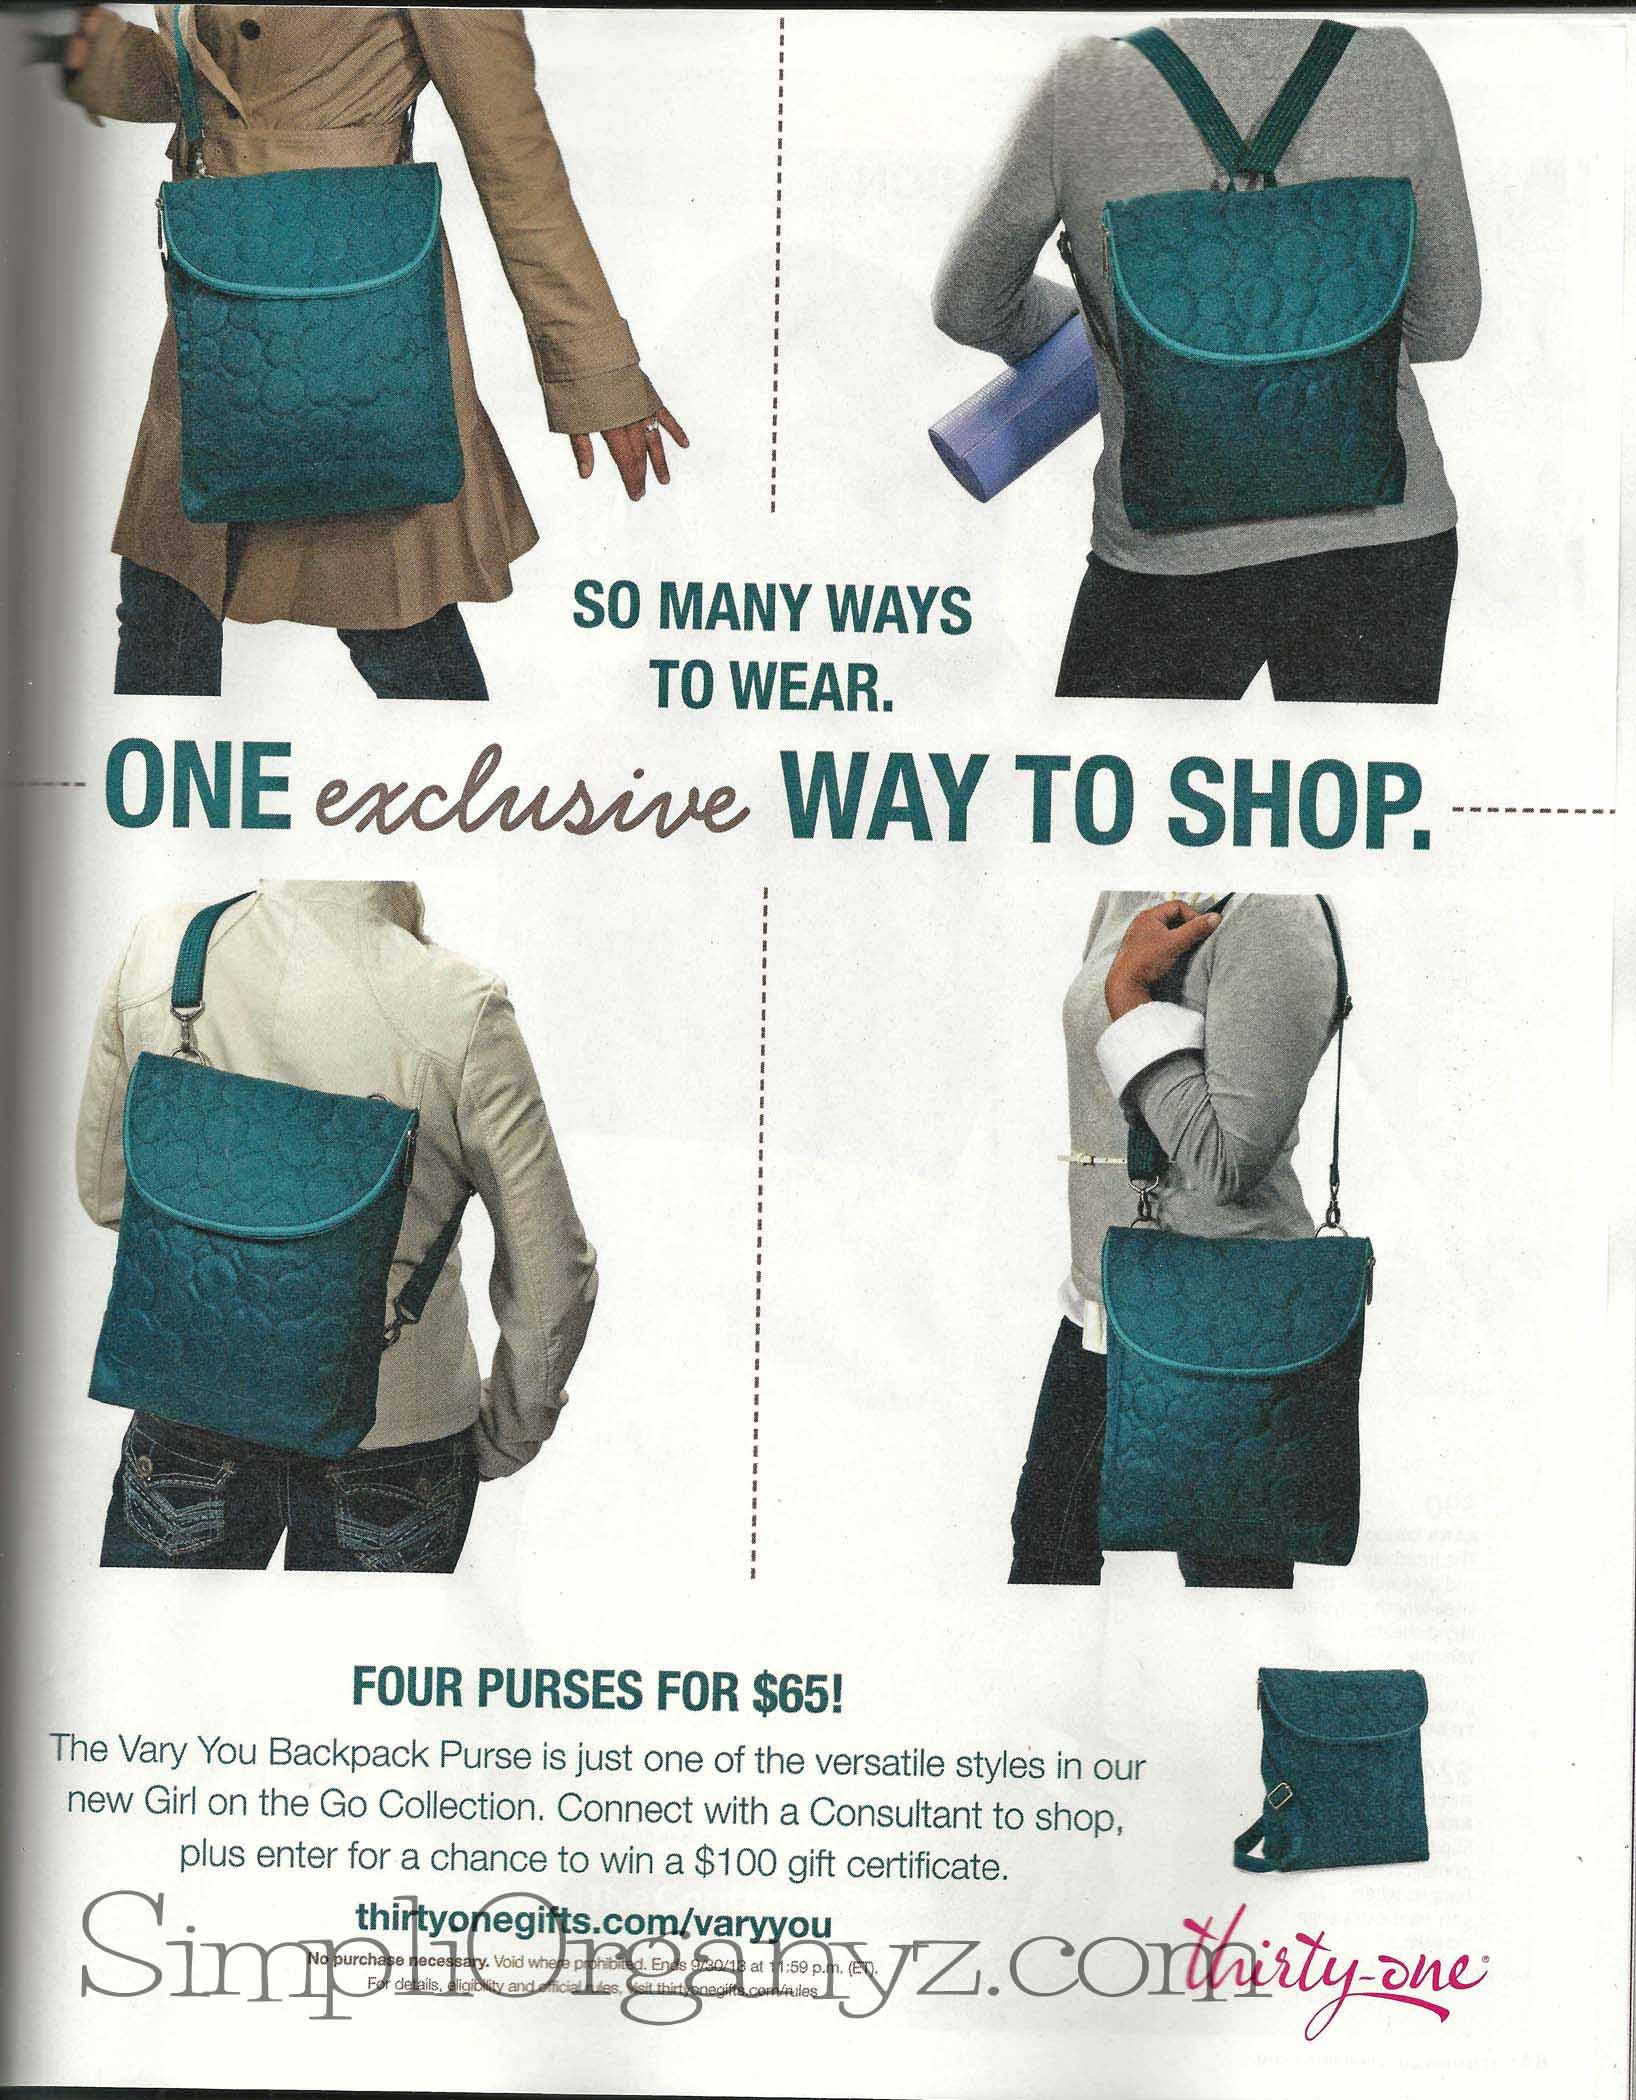 Vary You Backpack Purse | SimpliOrganyz